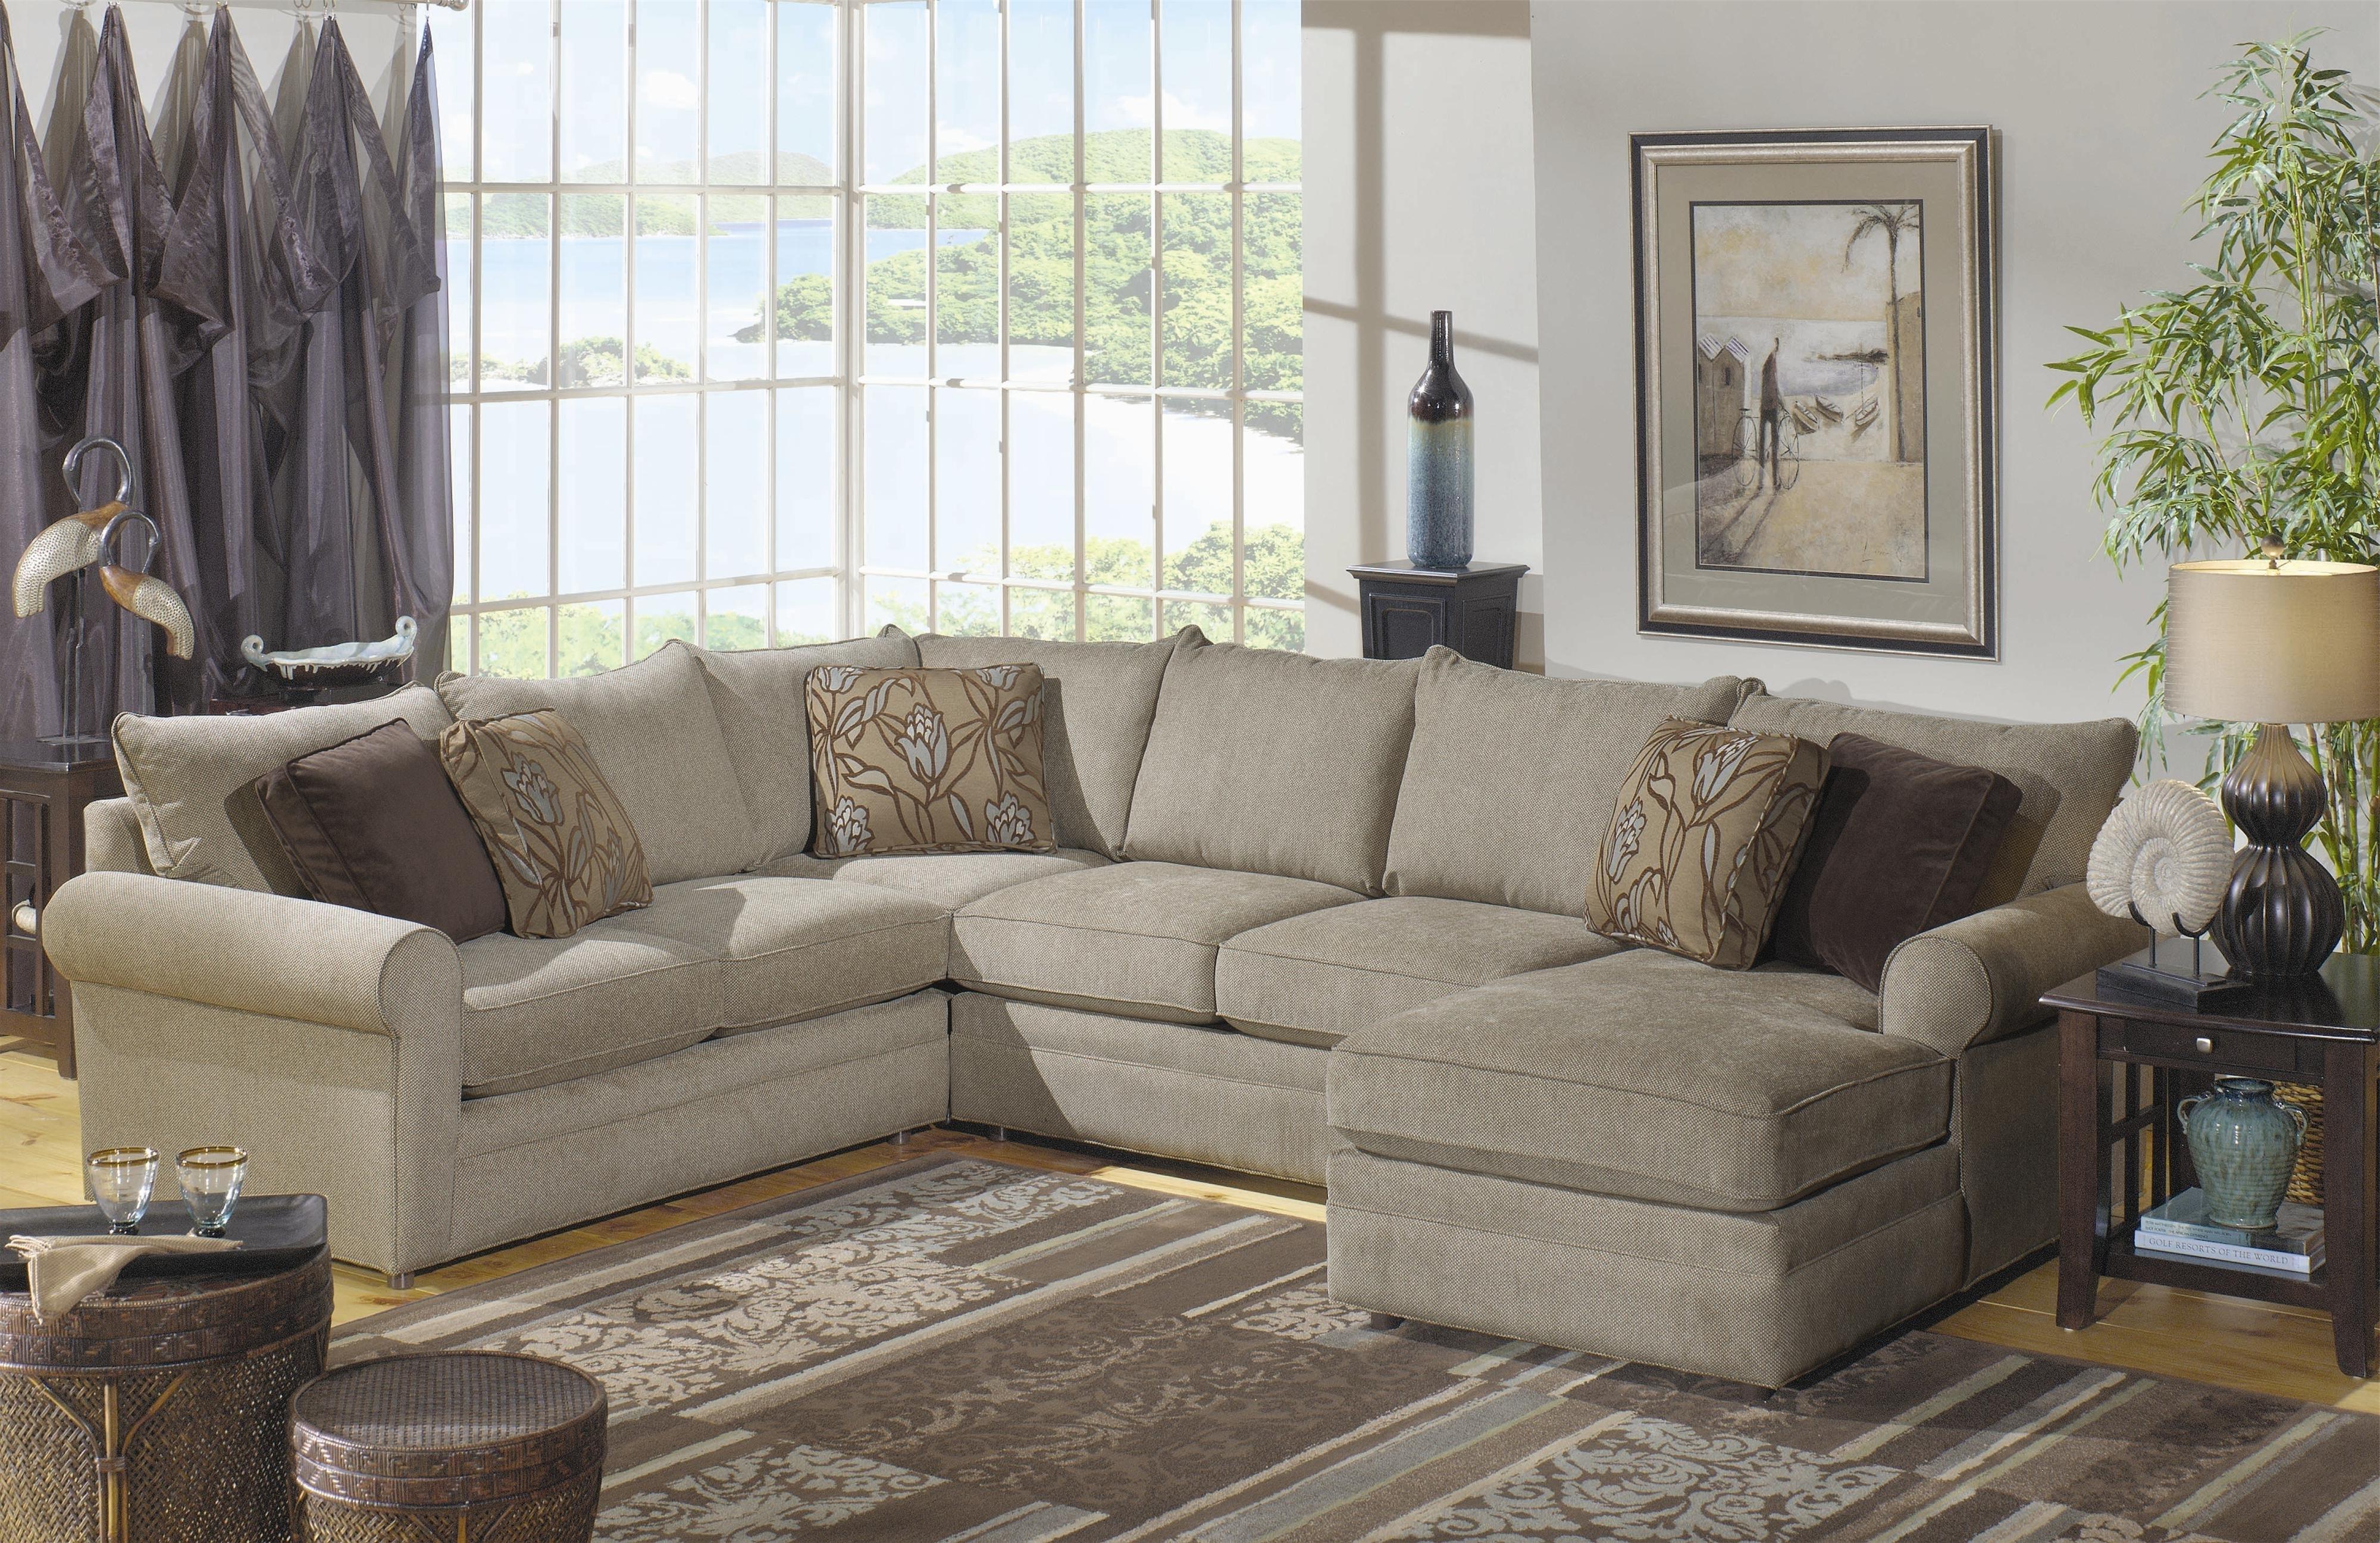 Favorite Gallery Craftsman Sectional Sofa – Mediasupload In Craftsman Sectional Sofas (View 7 of 15)